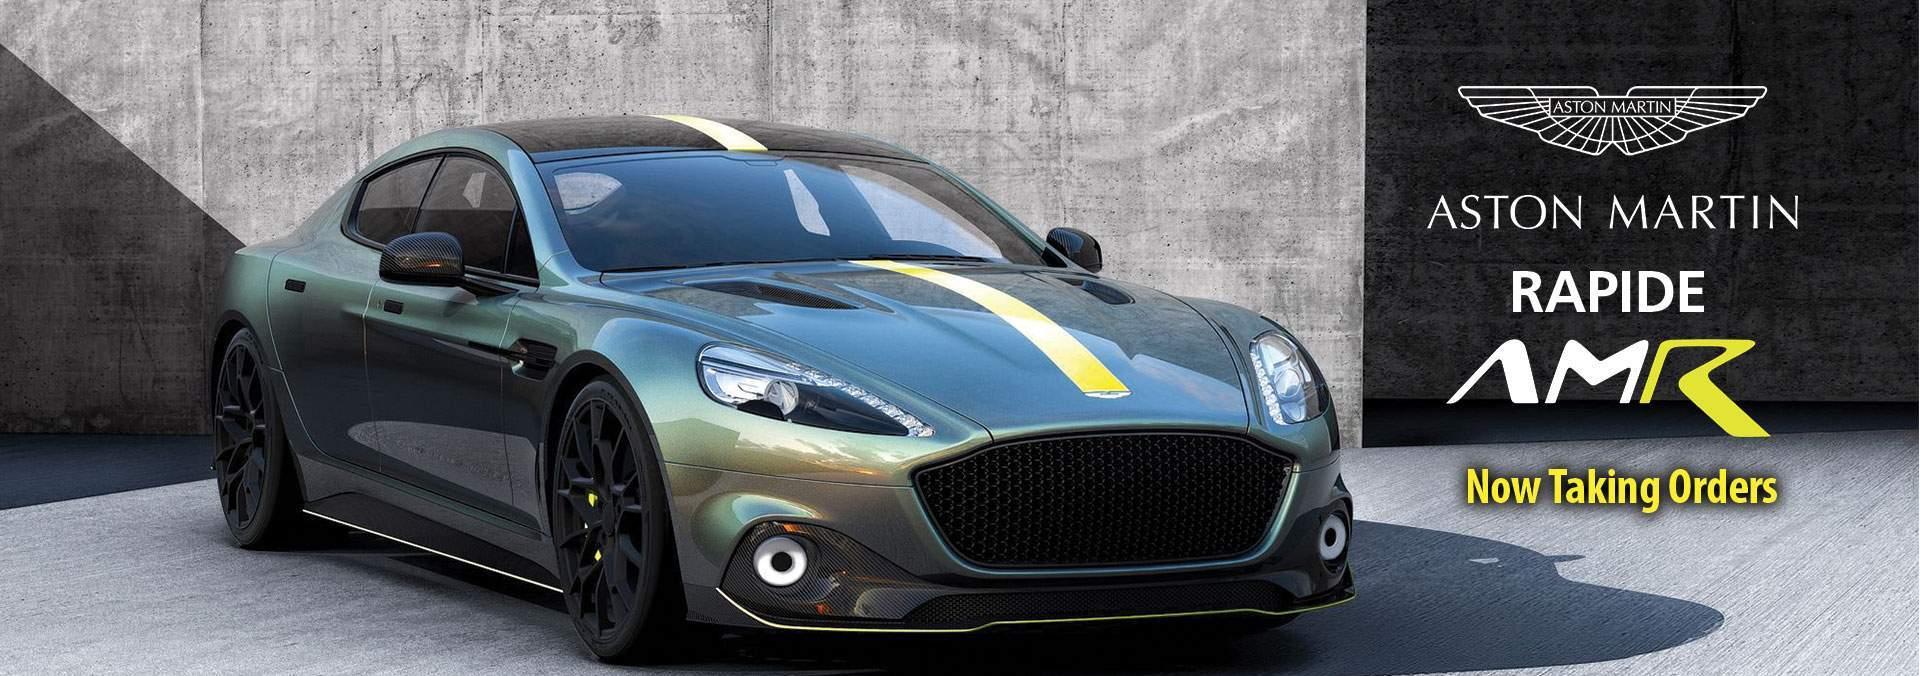 aston martin ferrari maserati porsche dealership greensboro nc used cars foreign cars italia